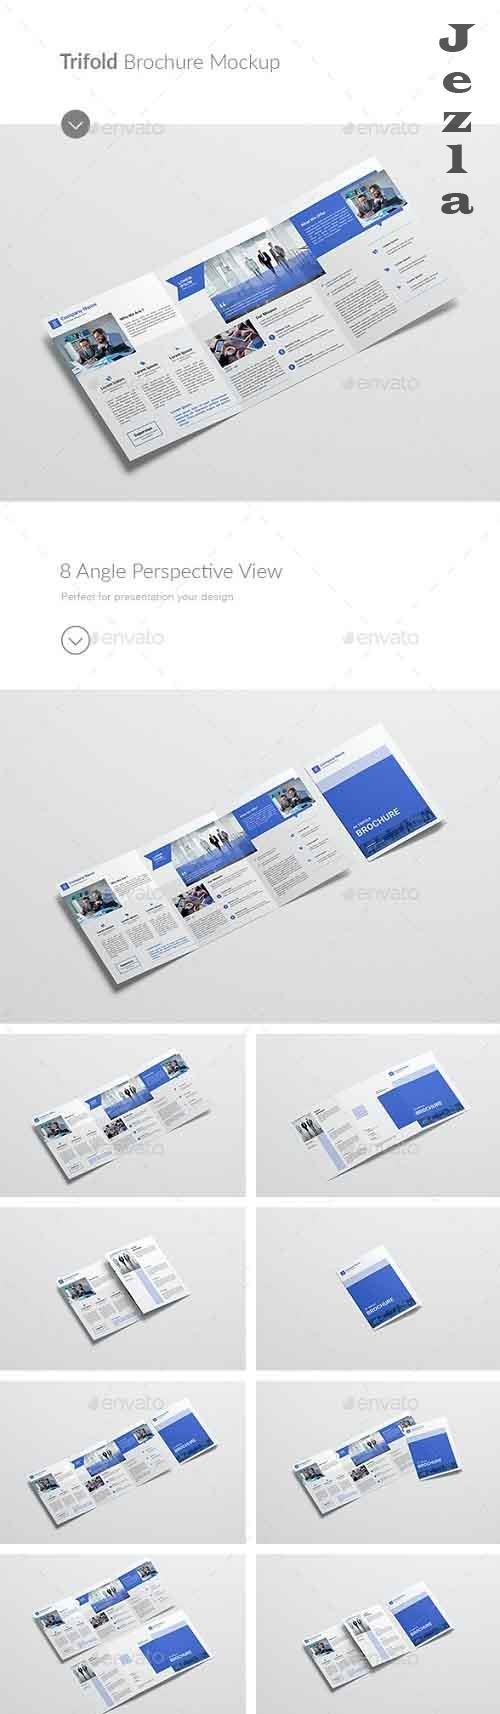 A4/A5 Trifold Brochure Mockup  - 28336237